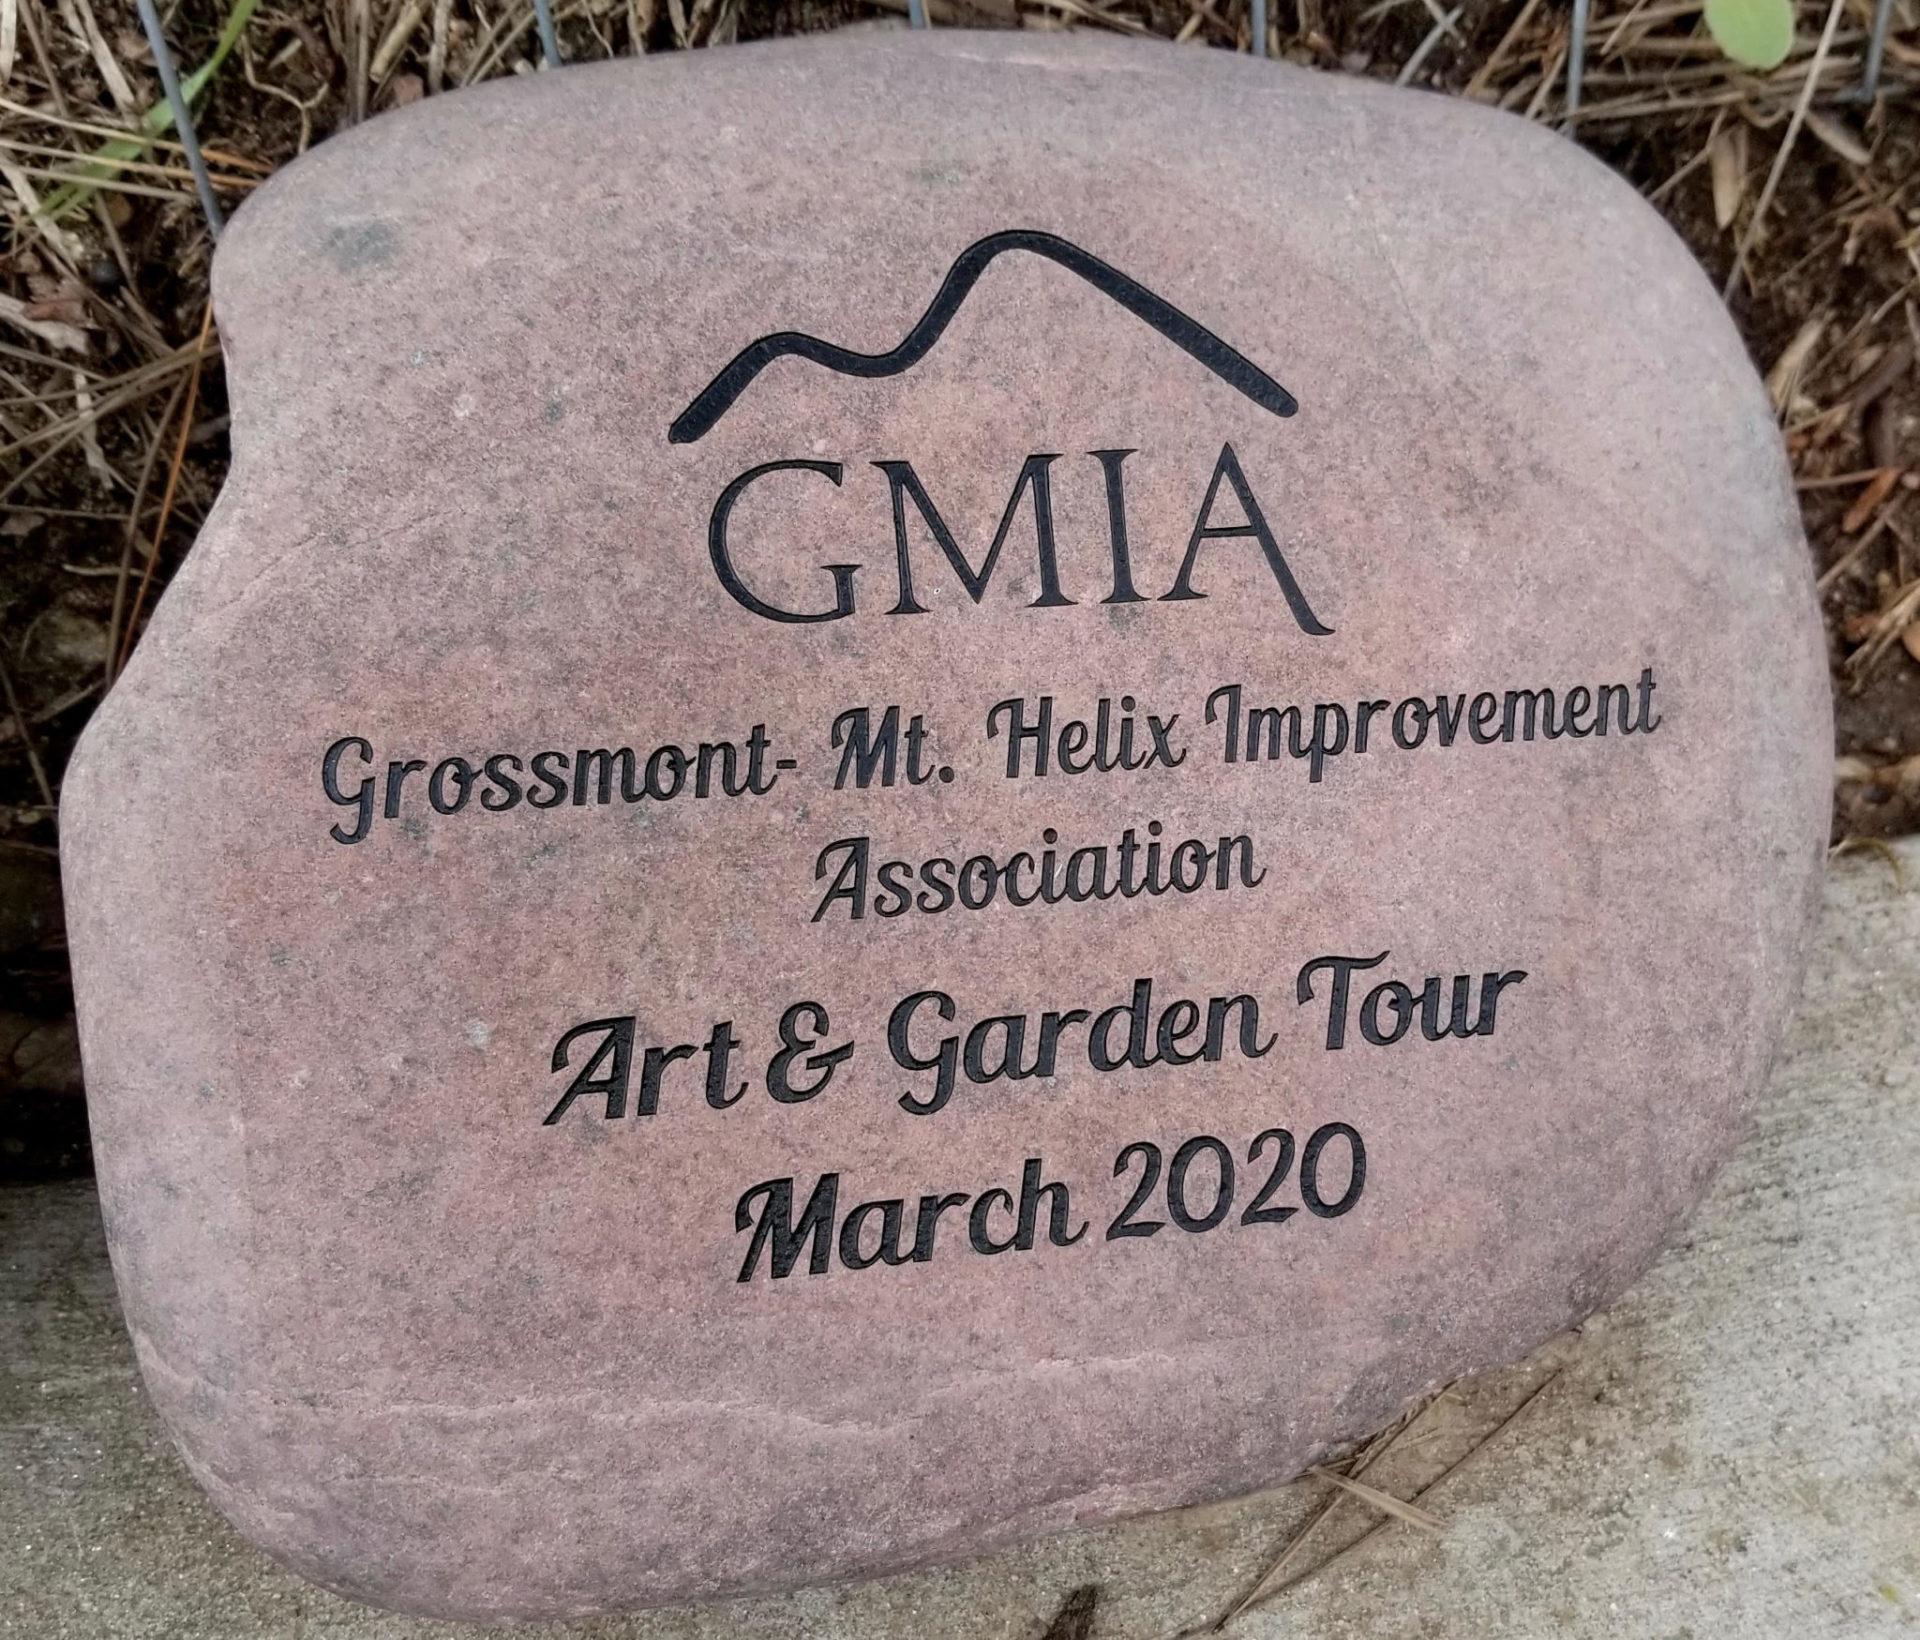 Highlights of the 2020 Garden Tour